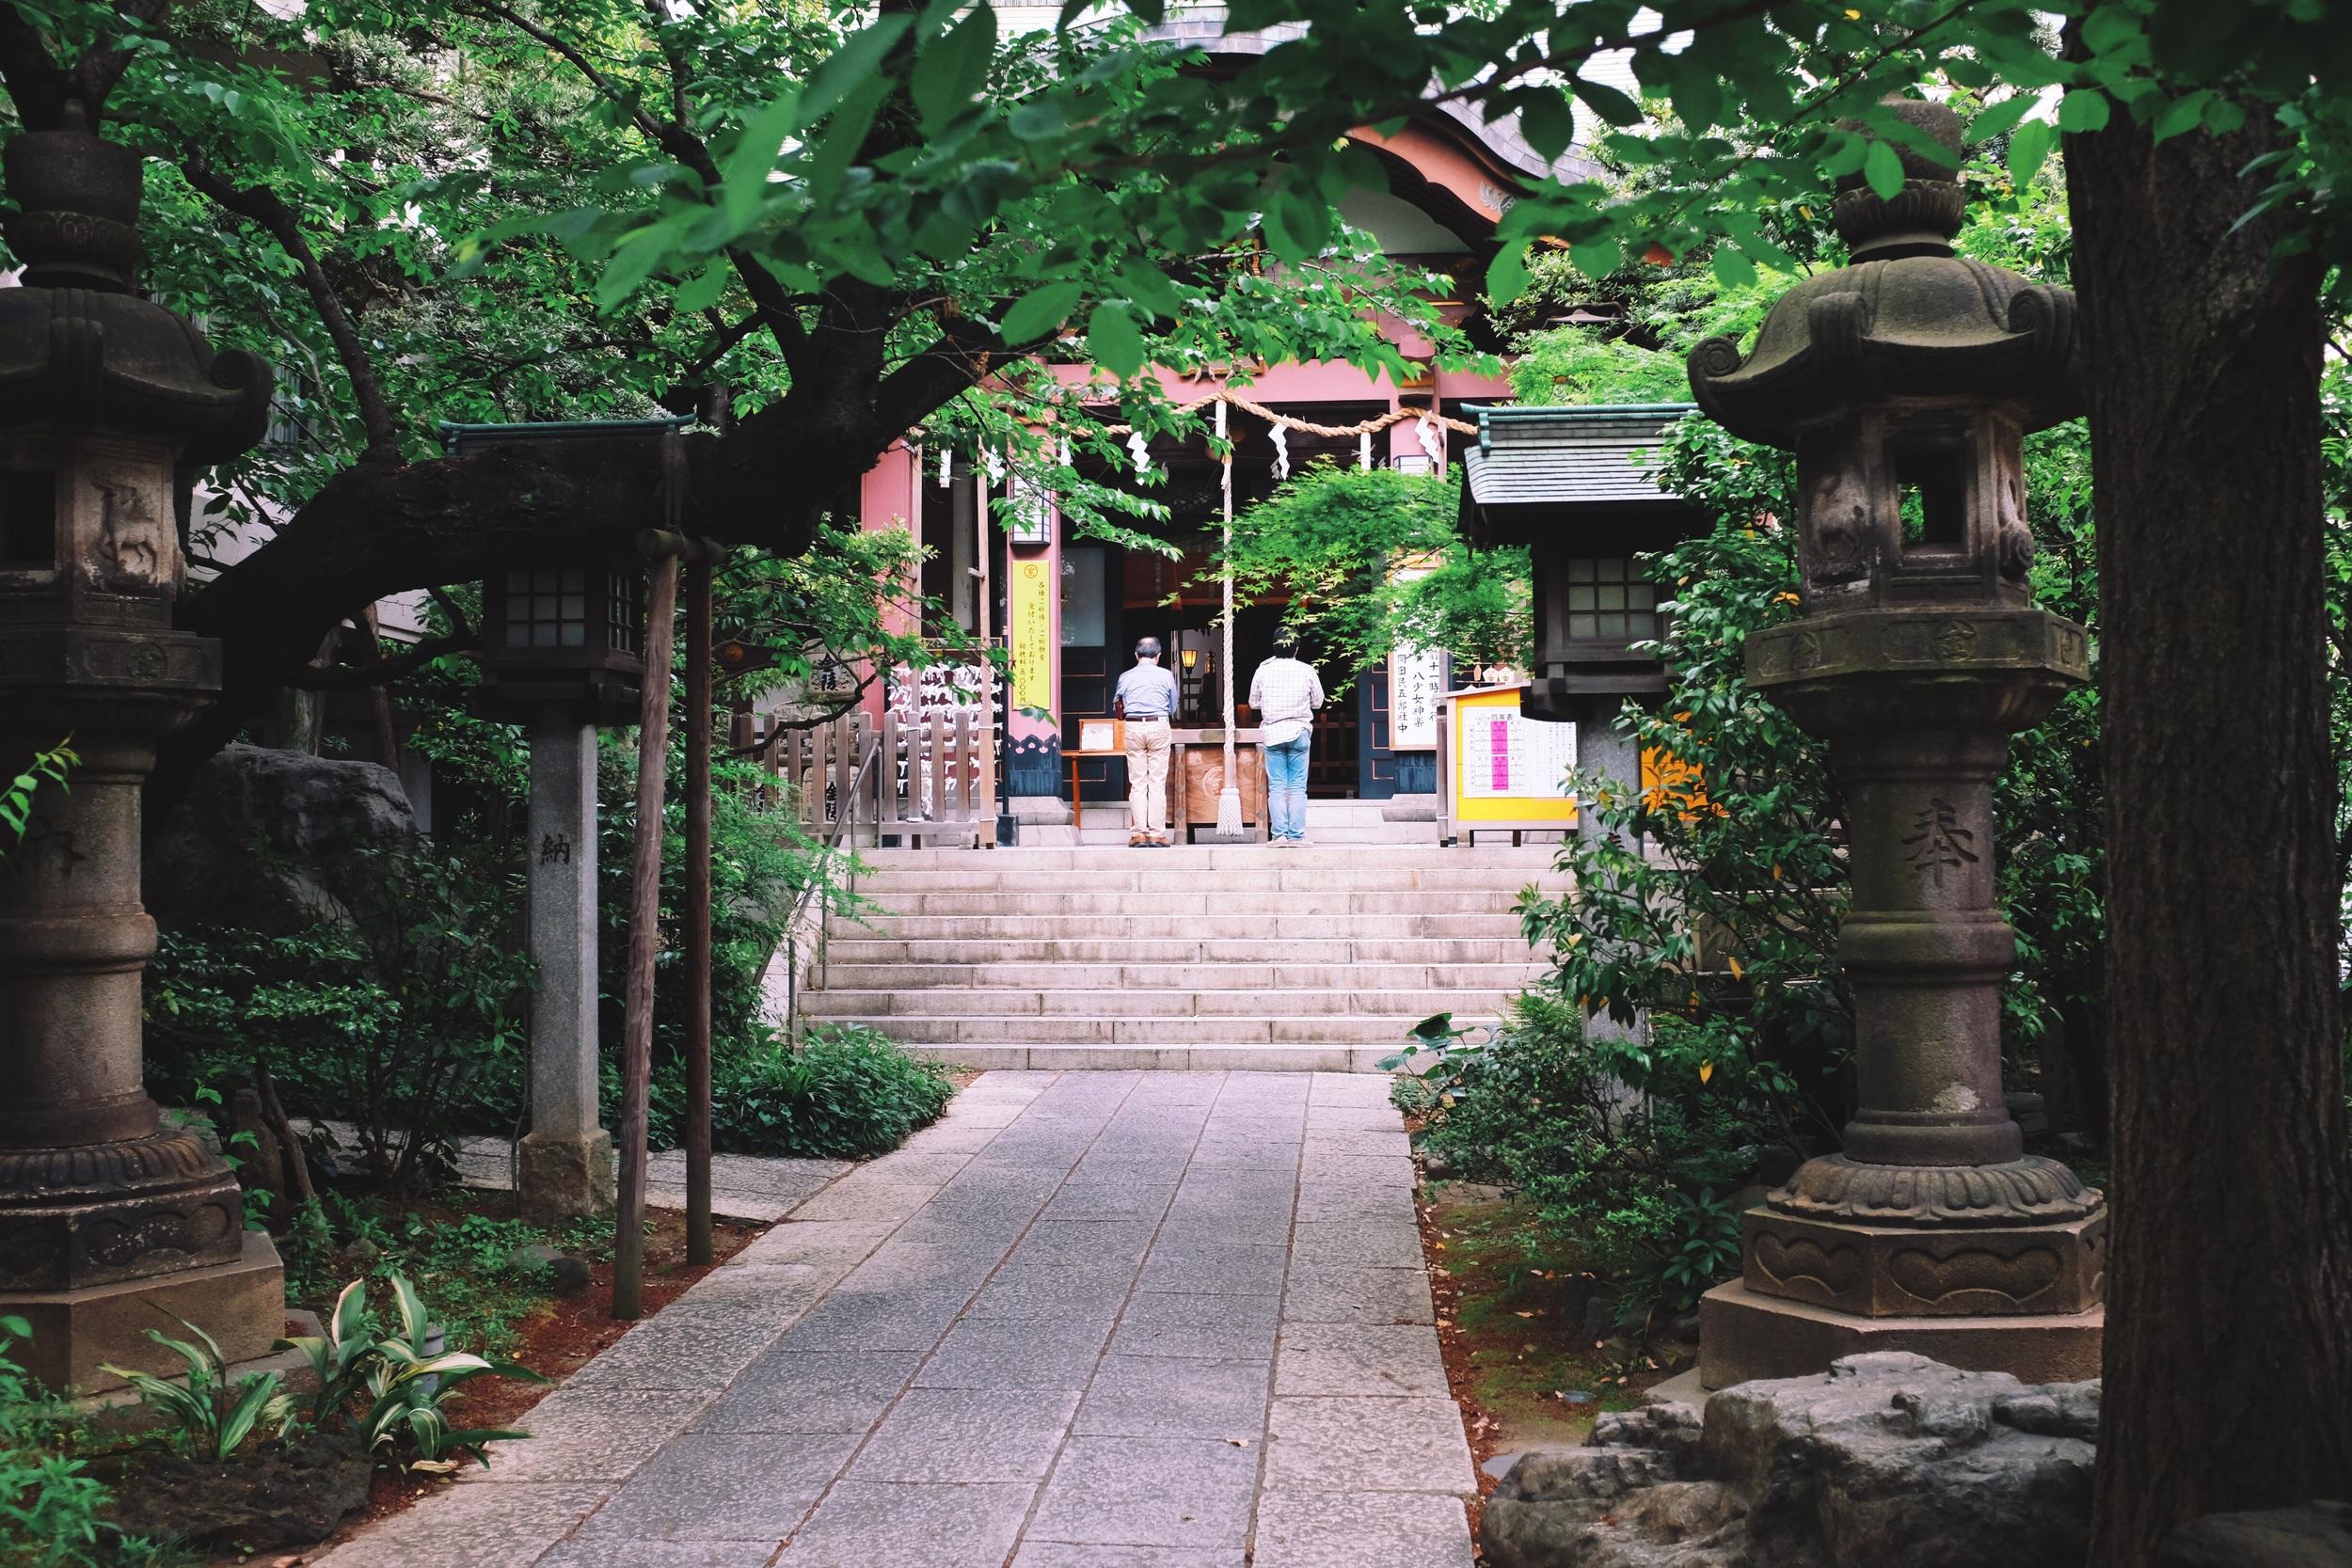 Shrine near  Tokyo Dome - Fujifilm x100t, ISO1250, f/3.2 1/60 sec. Processed in VSCO.